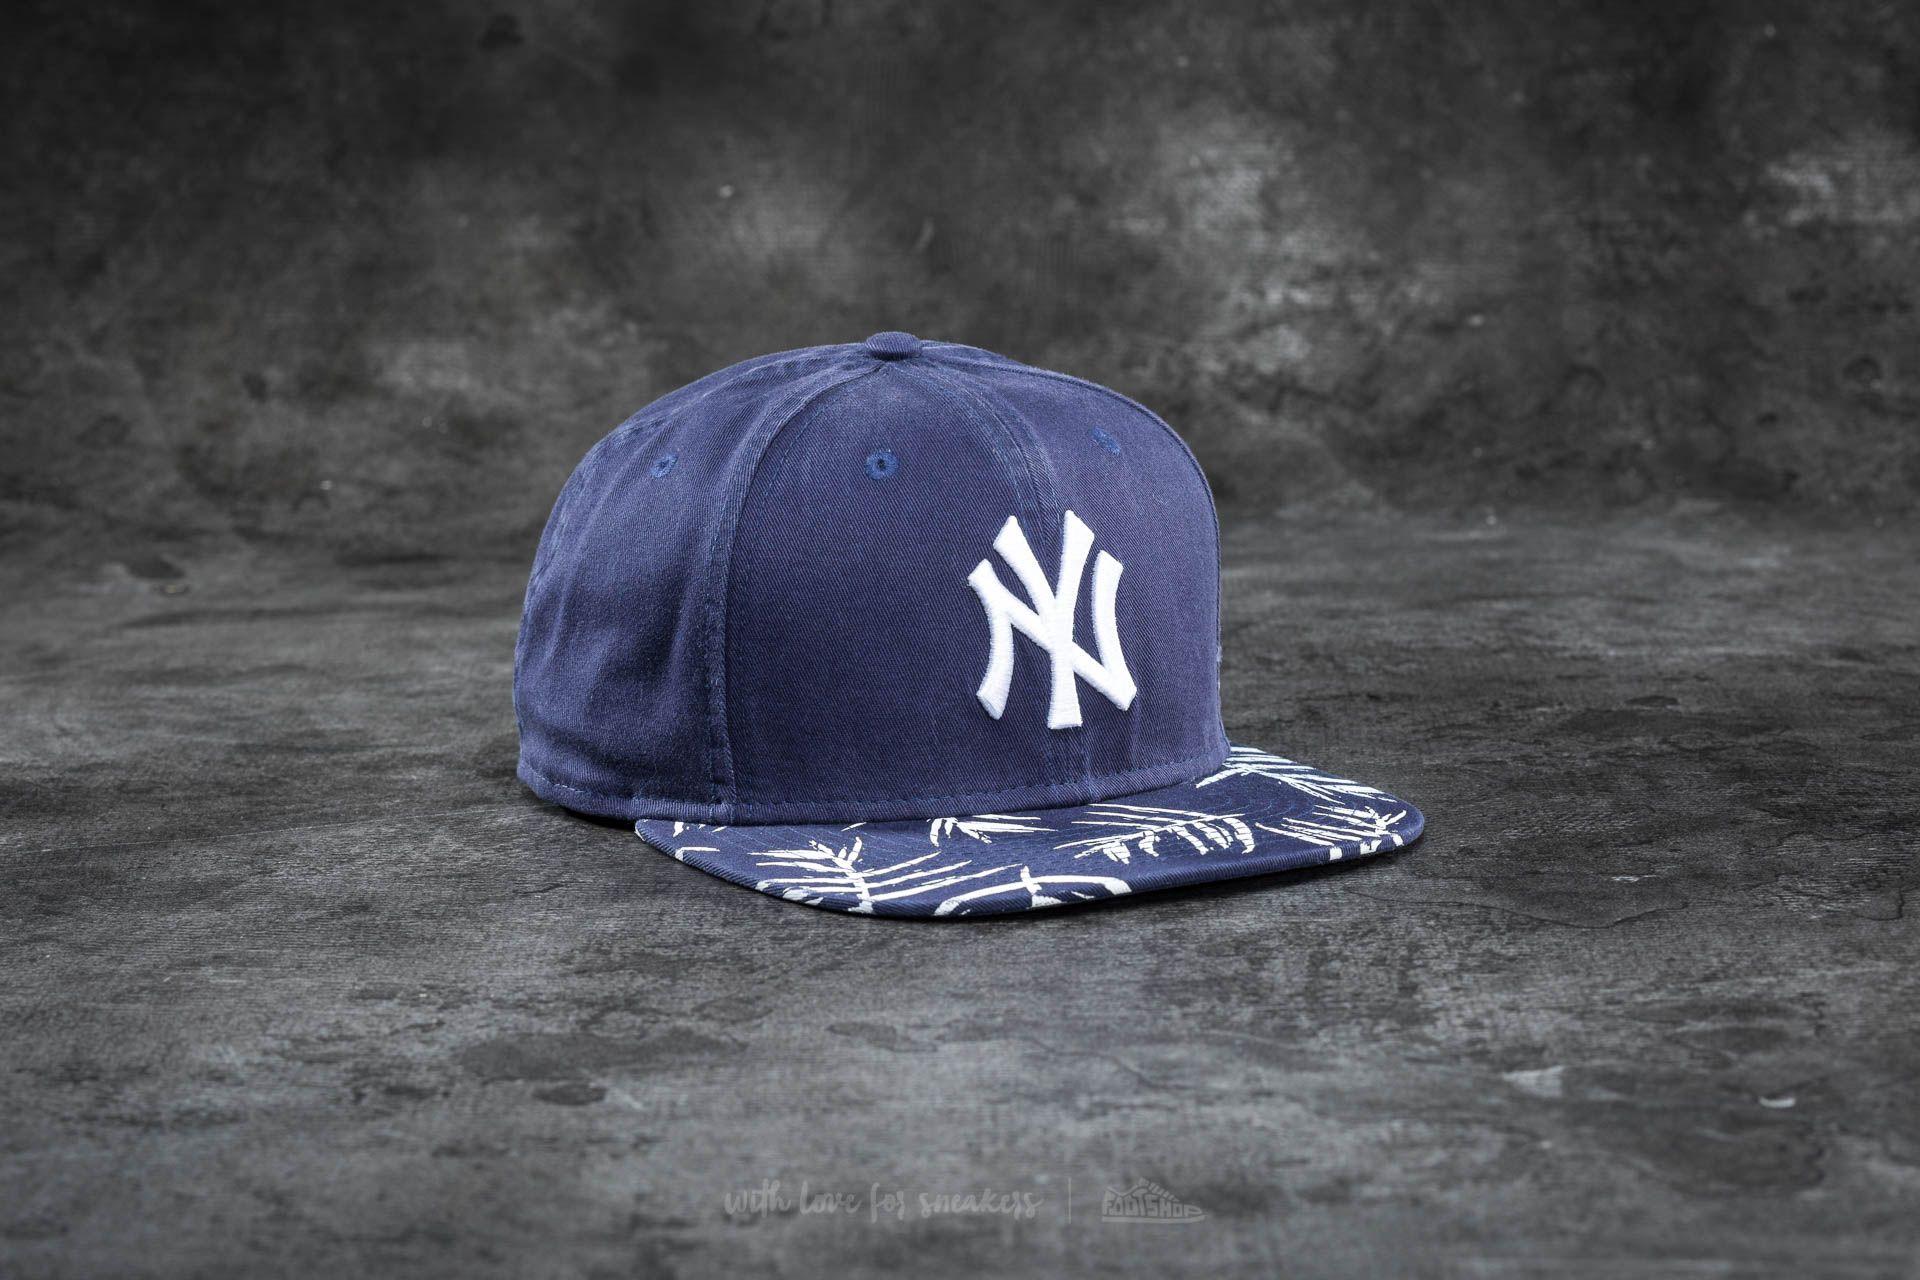 New Era 9Fifty Sandwash Visor Print New York Yankees Cap Navy  White a7c8293ba4a7